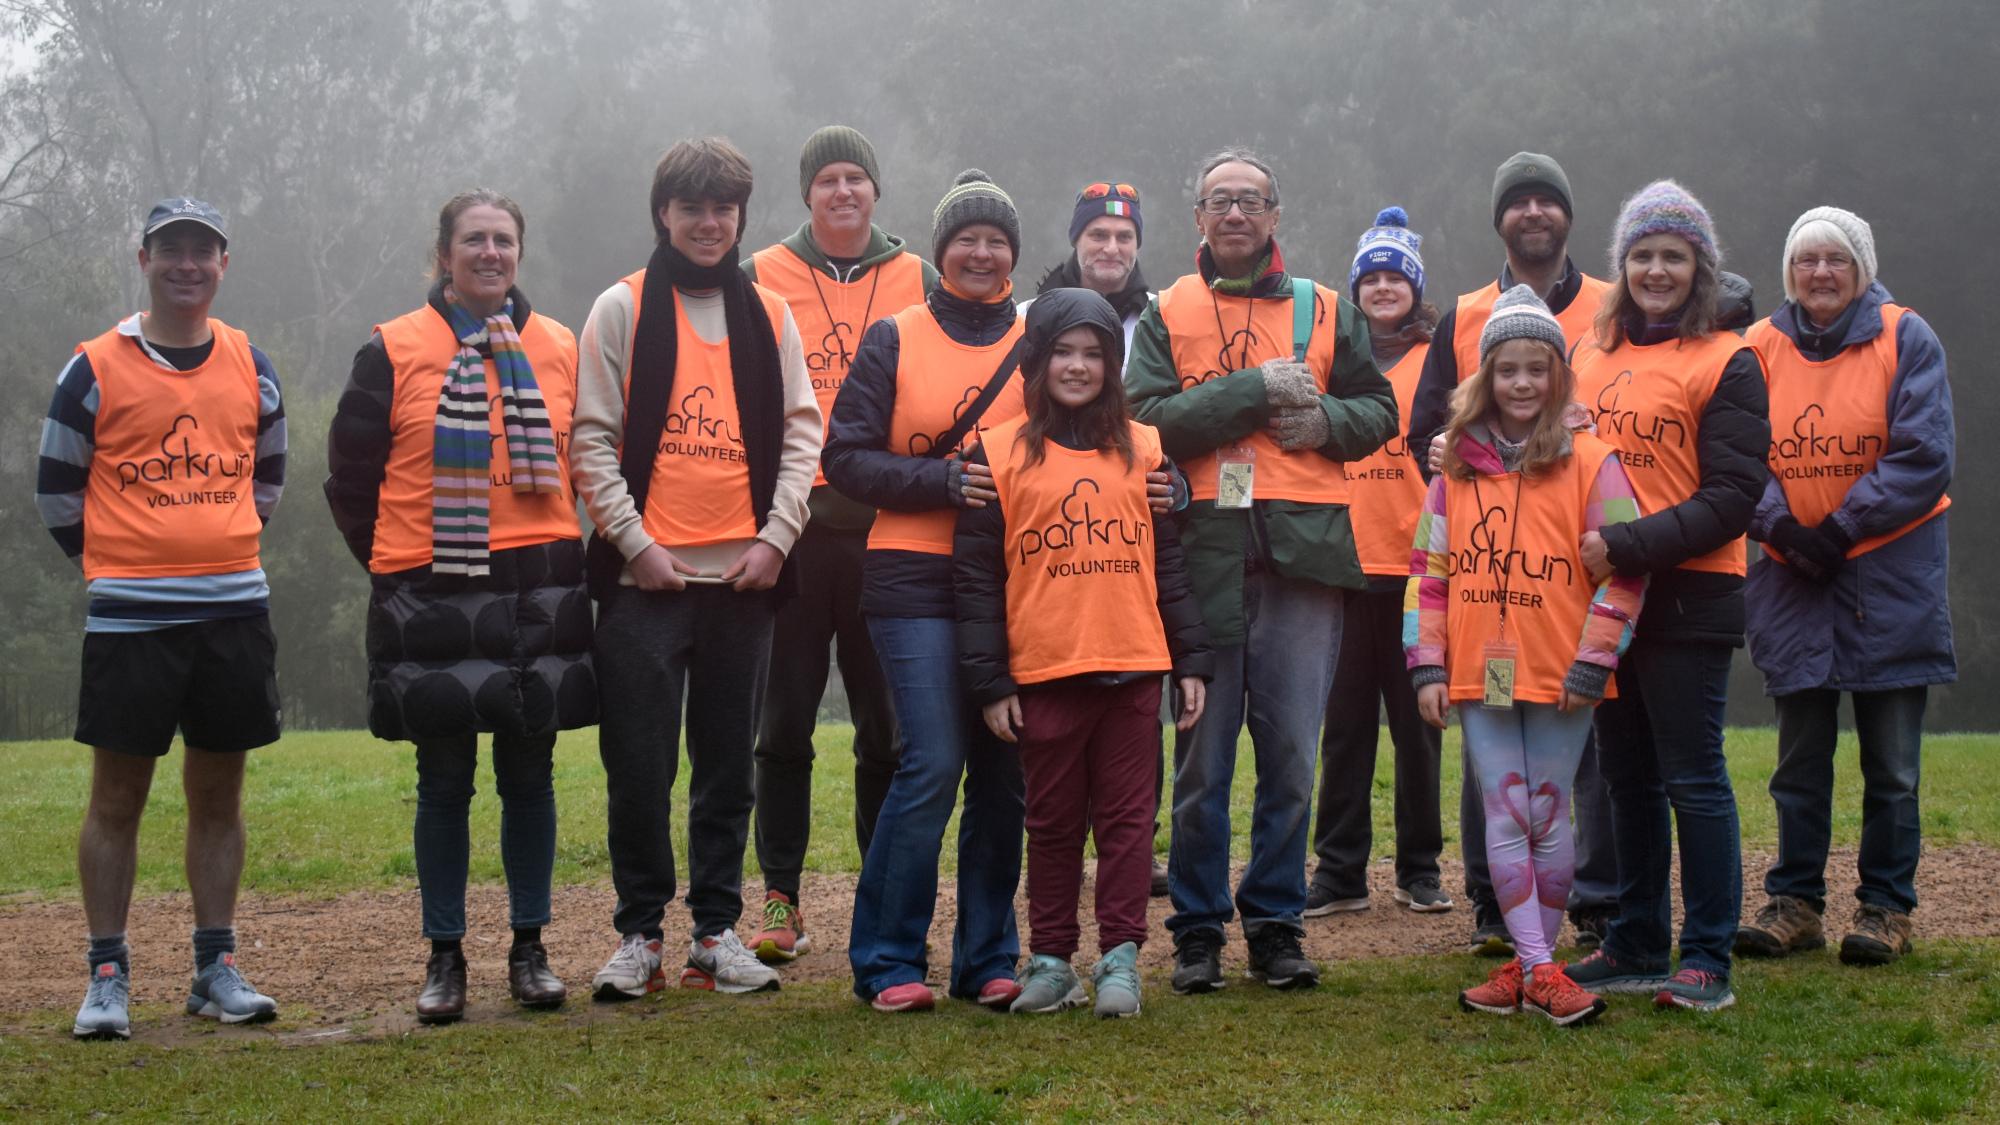 A group of thirteen volunteers wearing bright orange volunteer vests line up for a group photo.